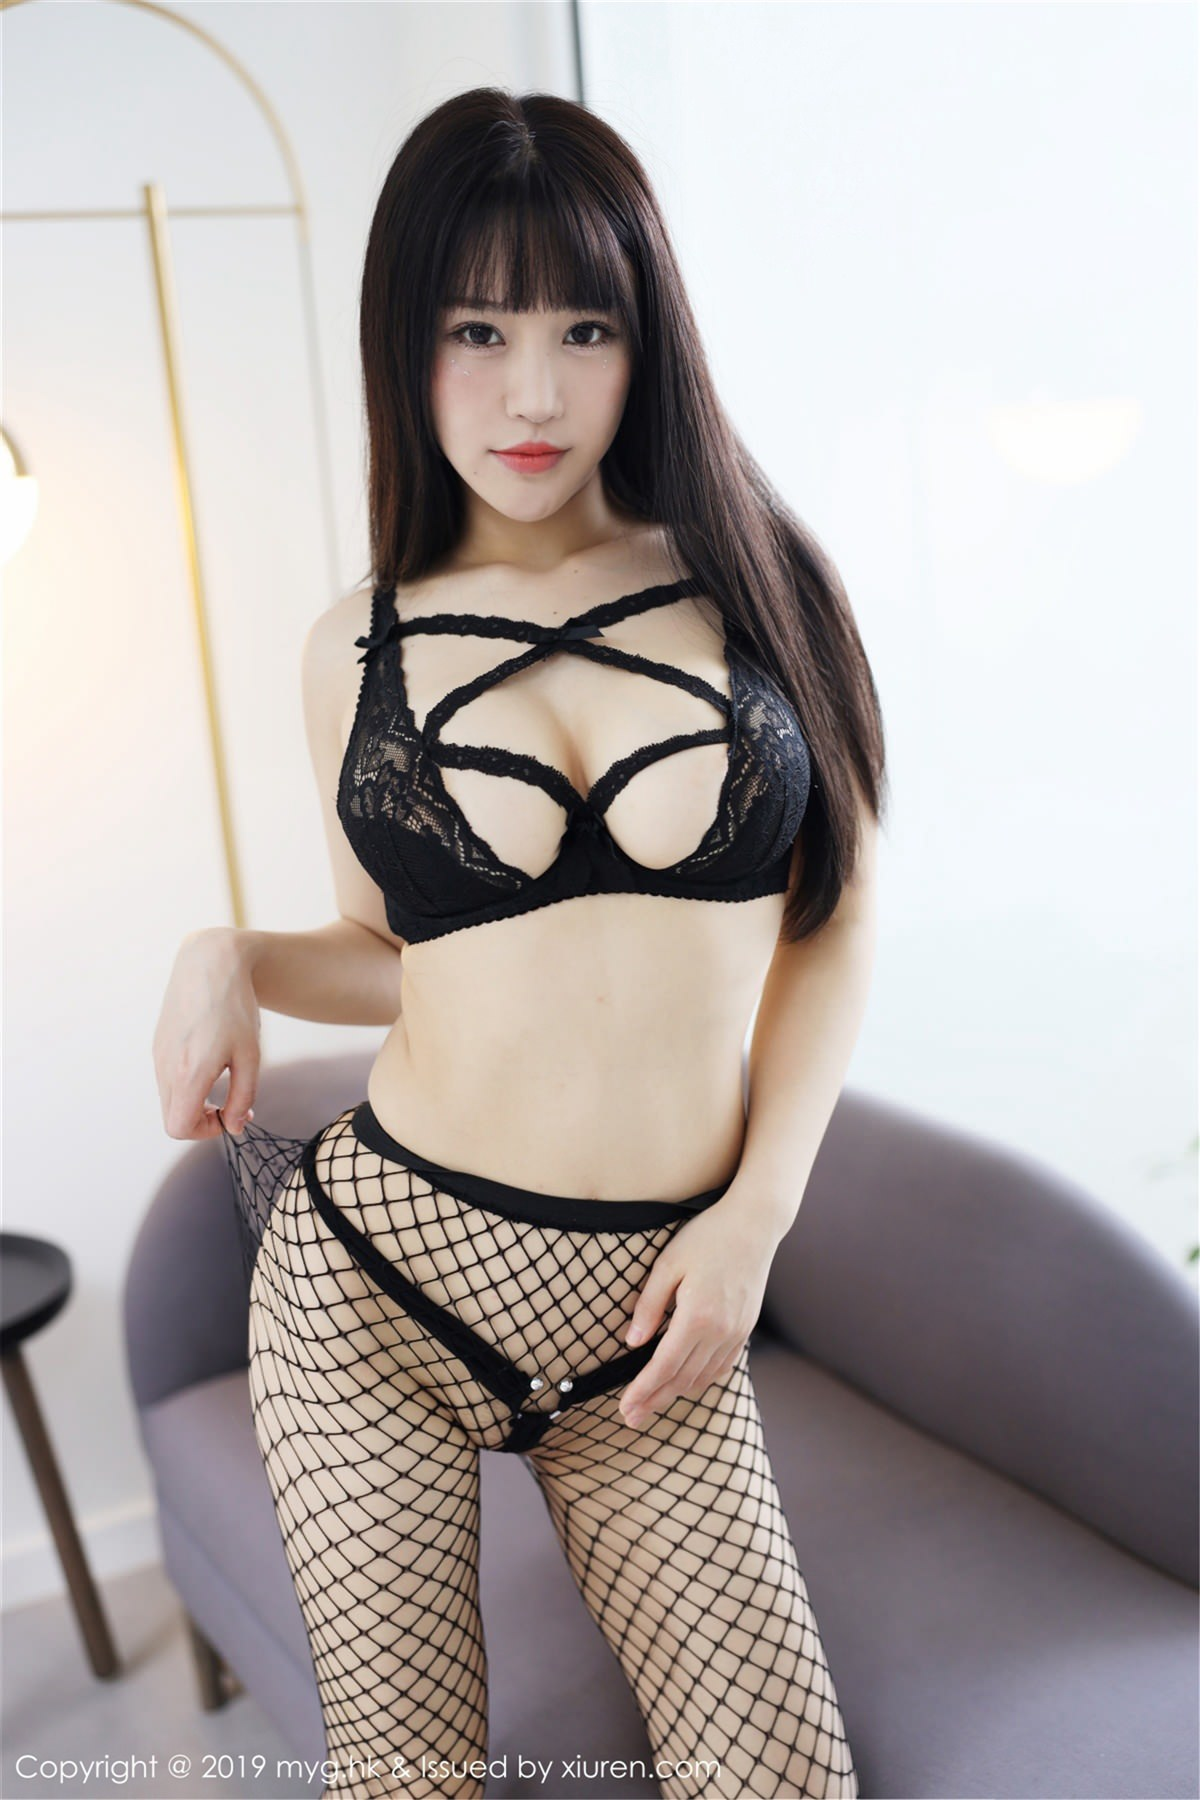 MyGirl Vol.357 29P, mygirl, Zhu Ke Er